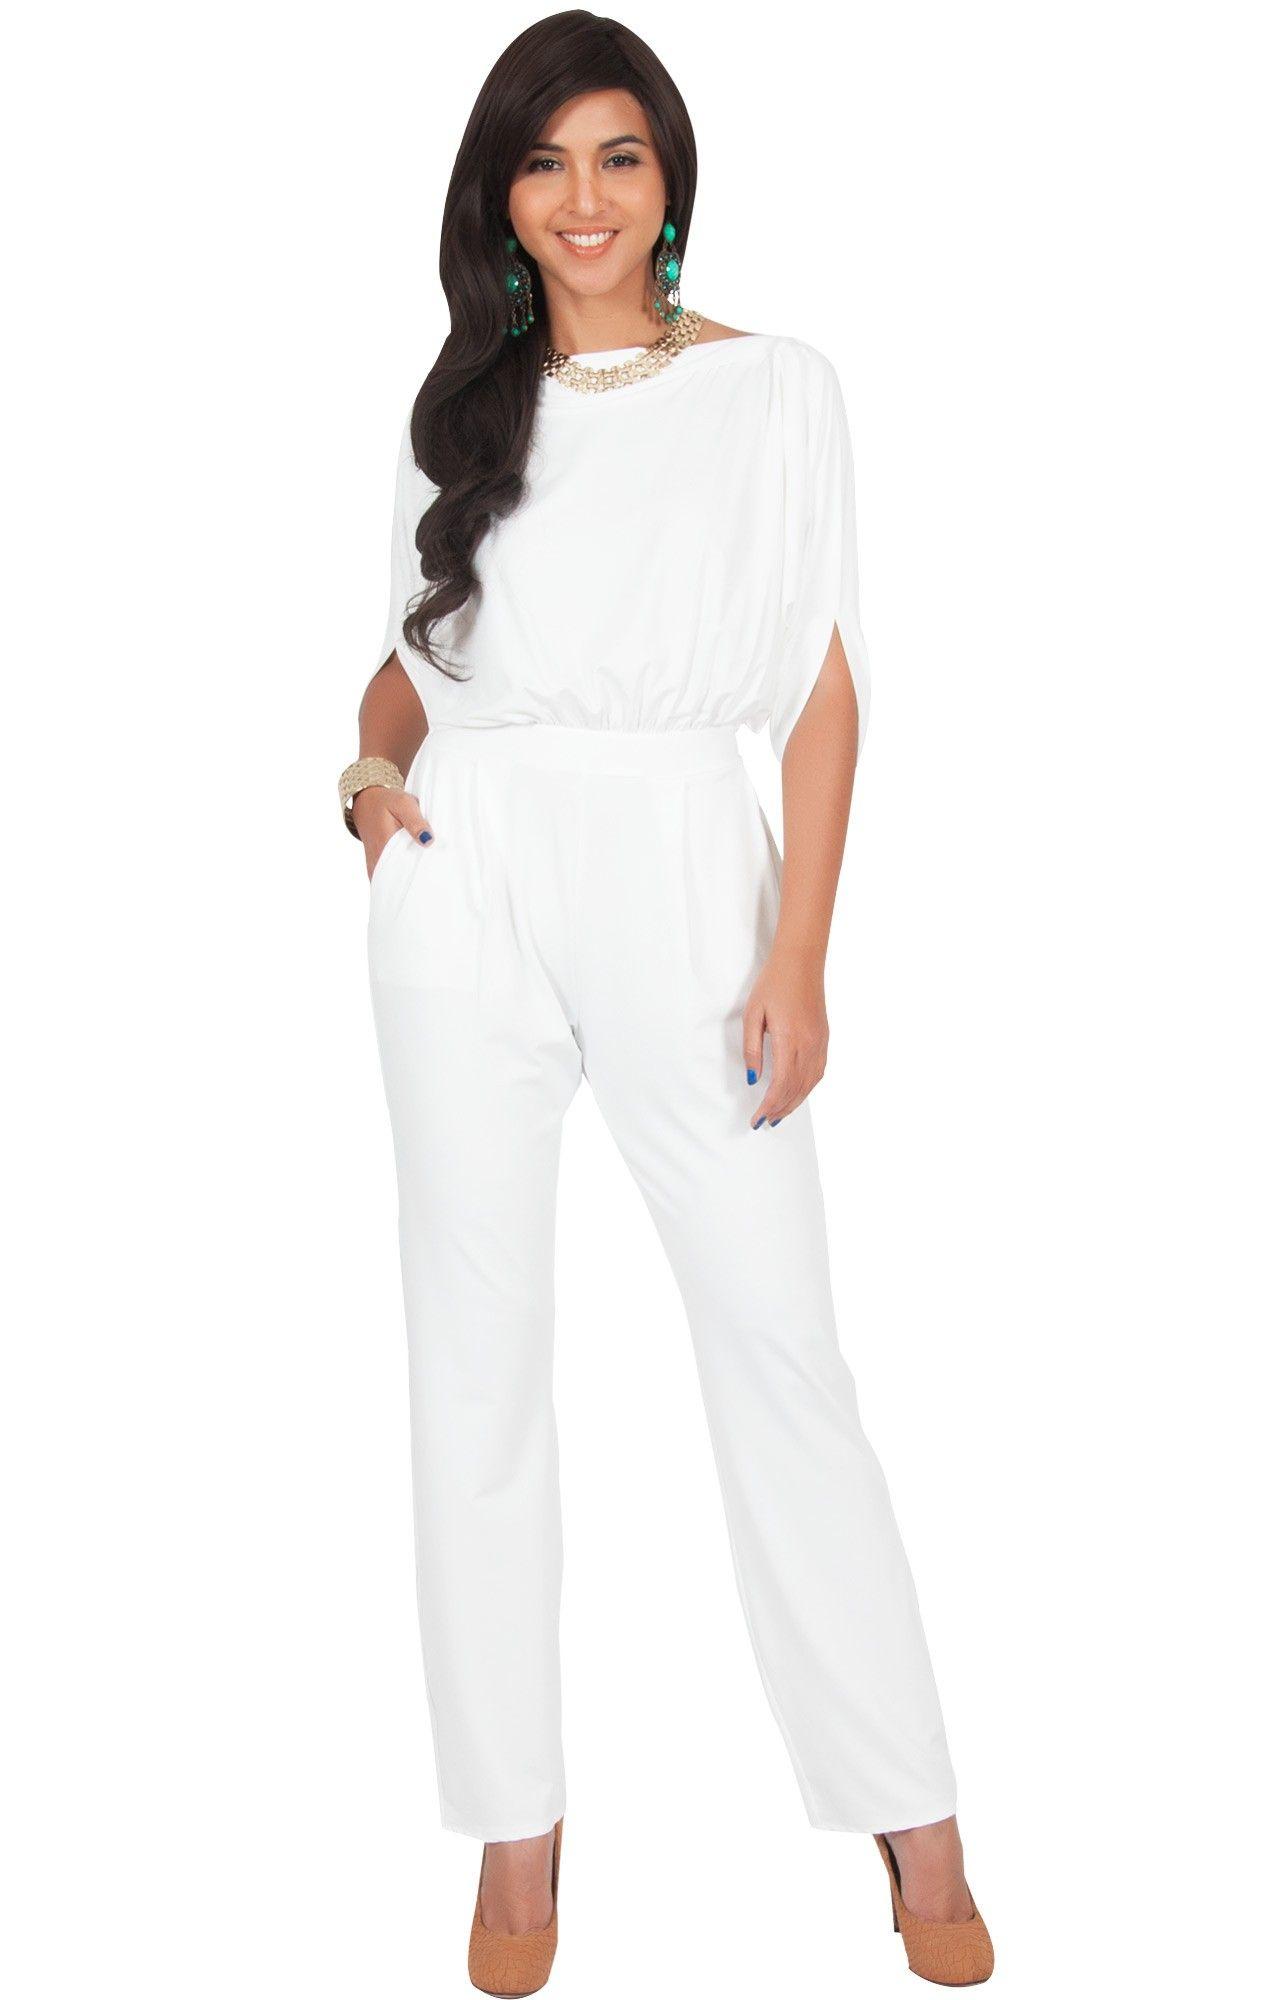 f69536d9ec7b TERESA - Dressy Jumpsuits Cocktail Batwing Sleeve Classy Formal in ...